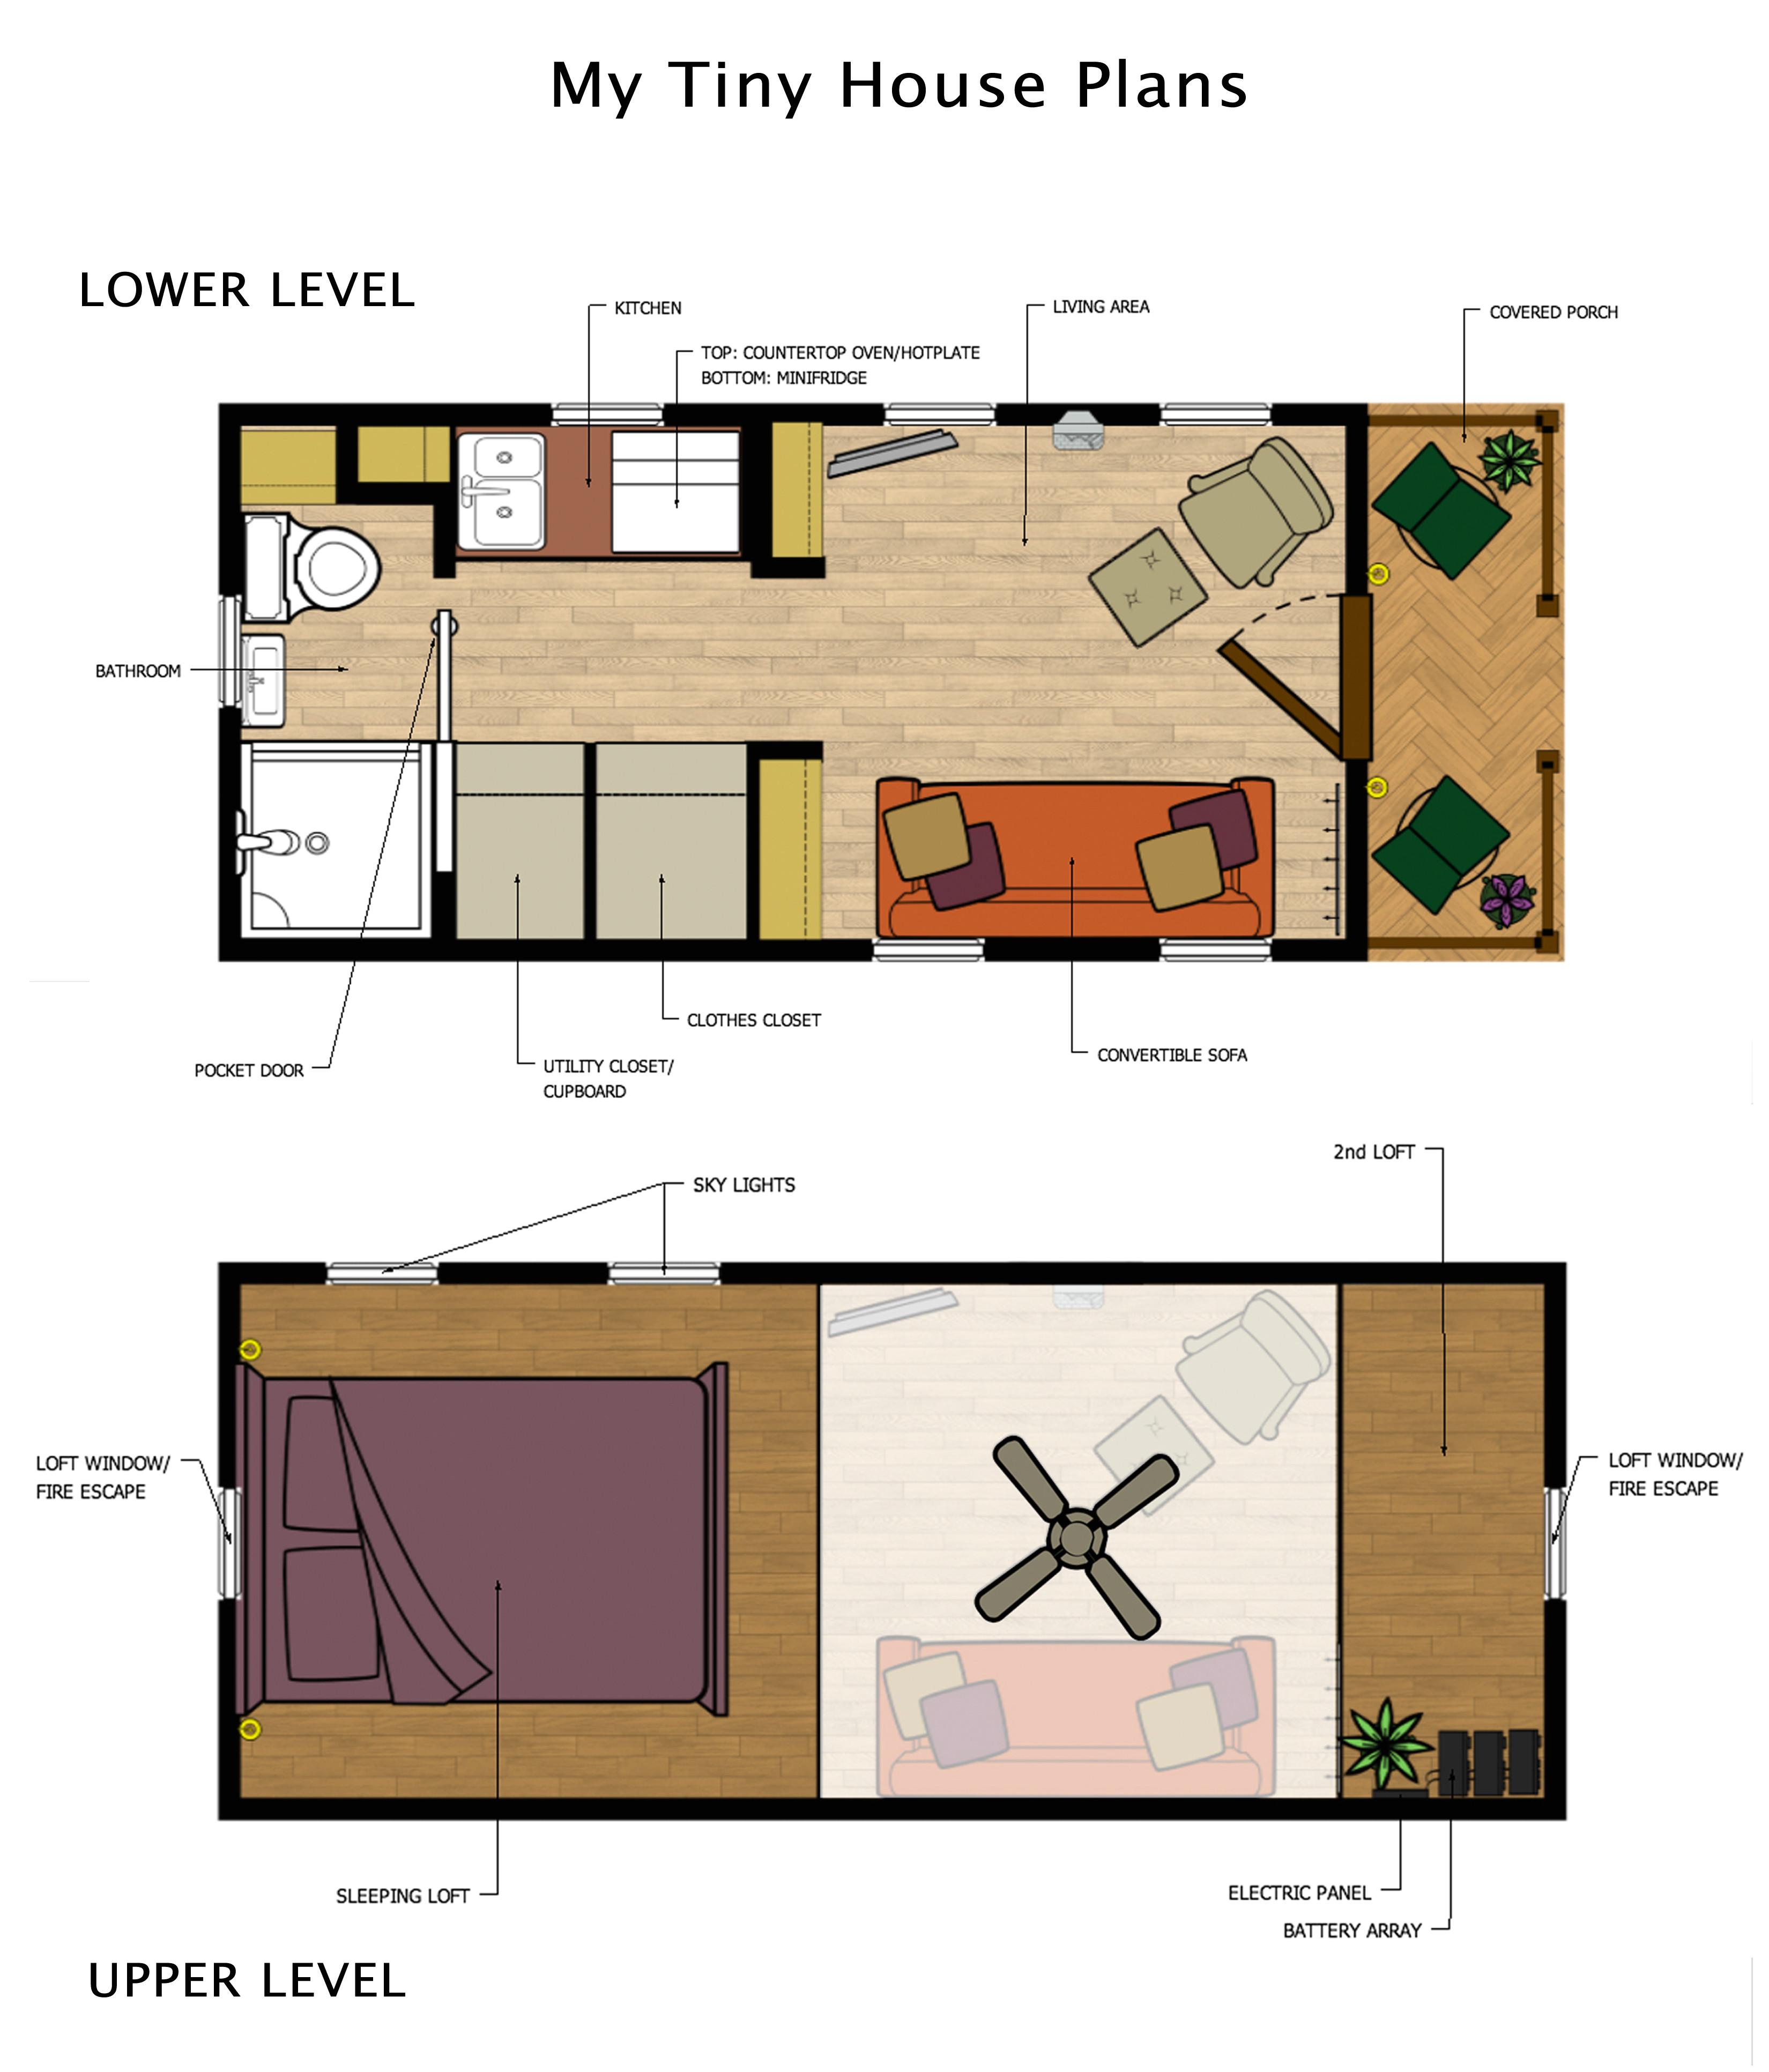 Tiny Home Floor Plan Tiny House Plans My Life Price